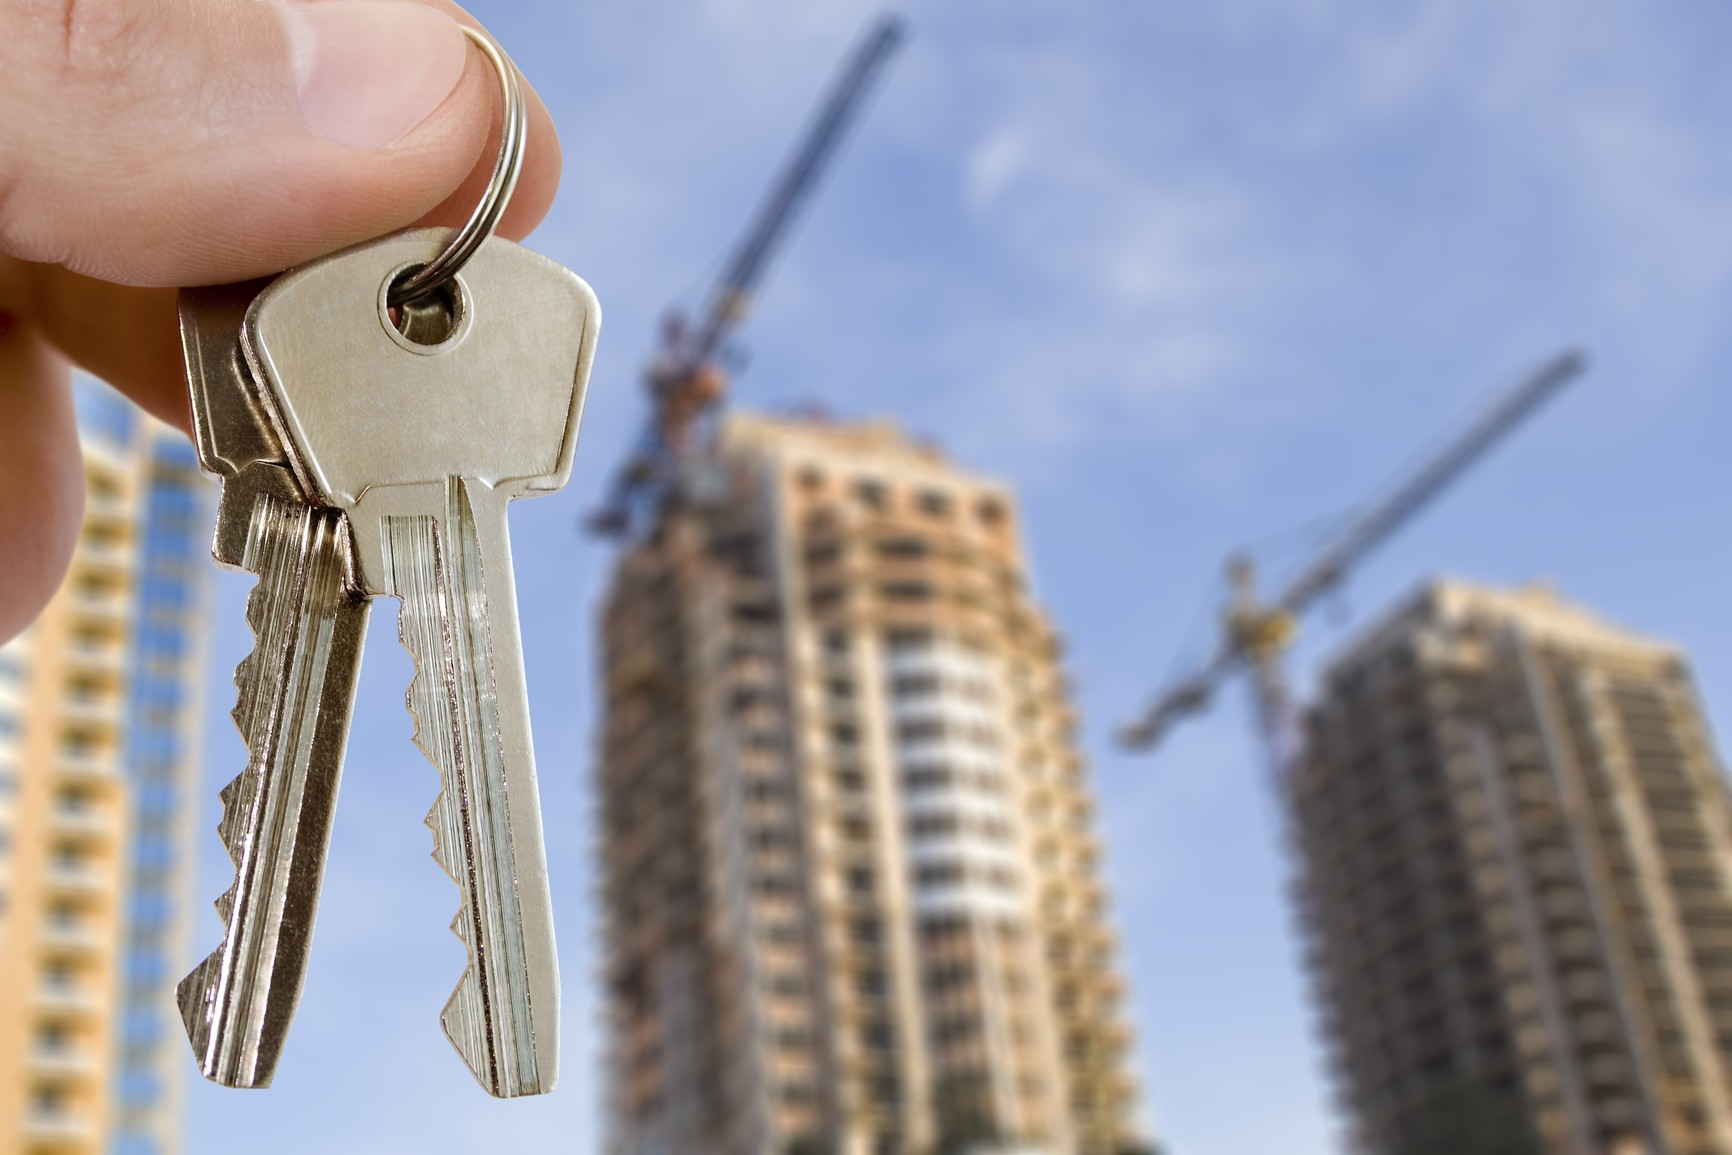 В 2020г. власти хотят увеличить объем ипотеки вдвое